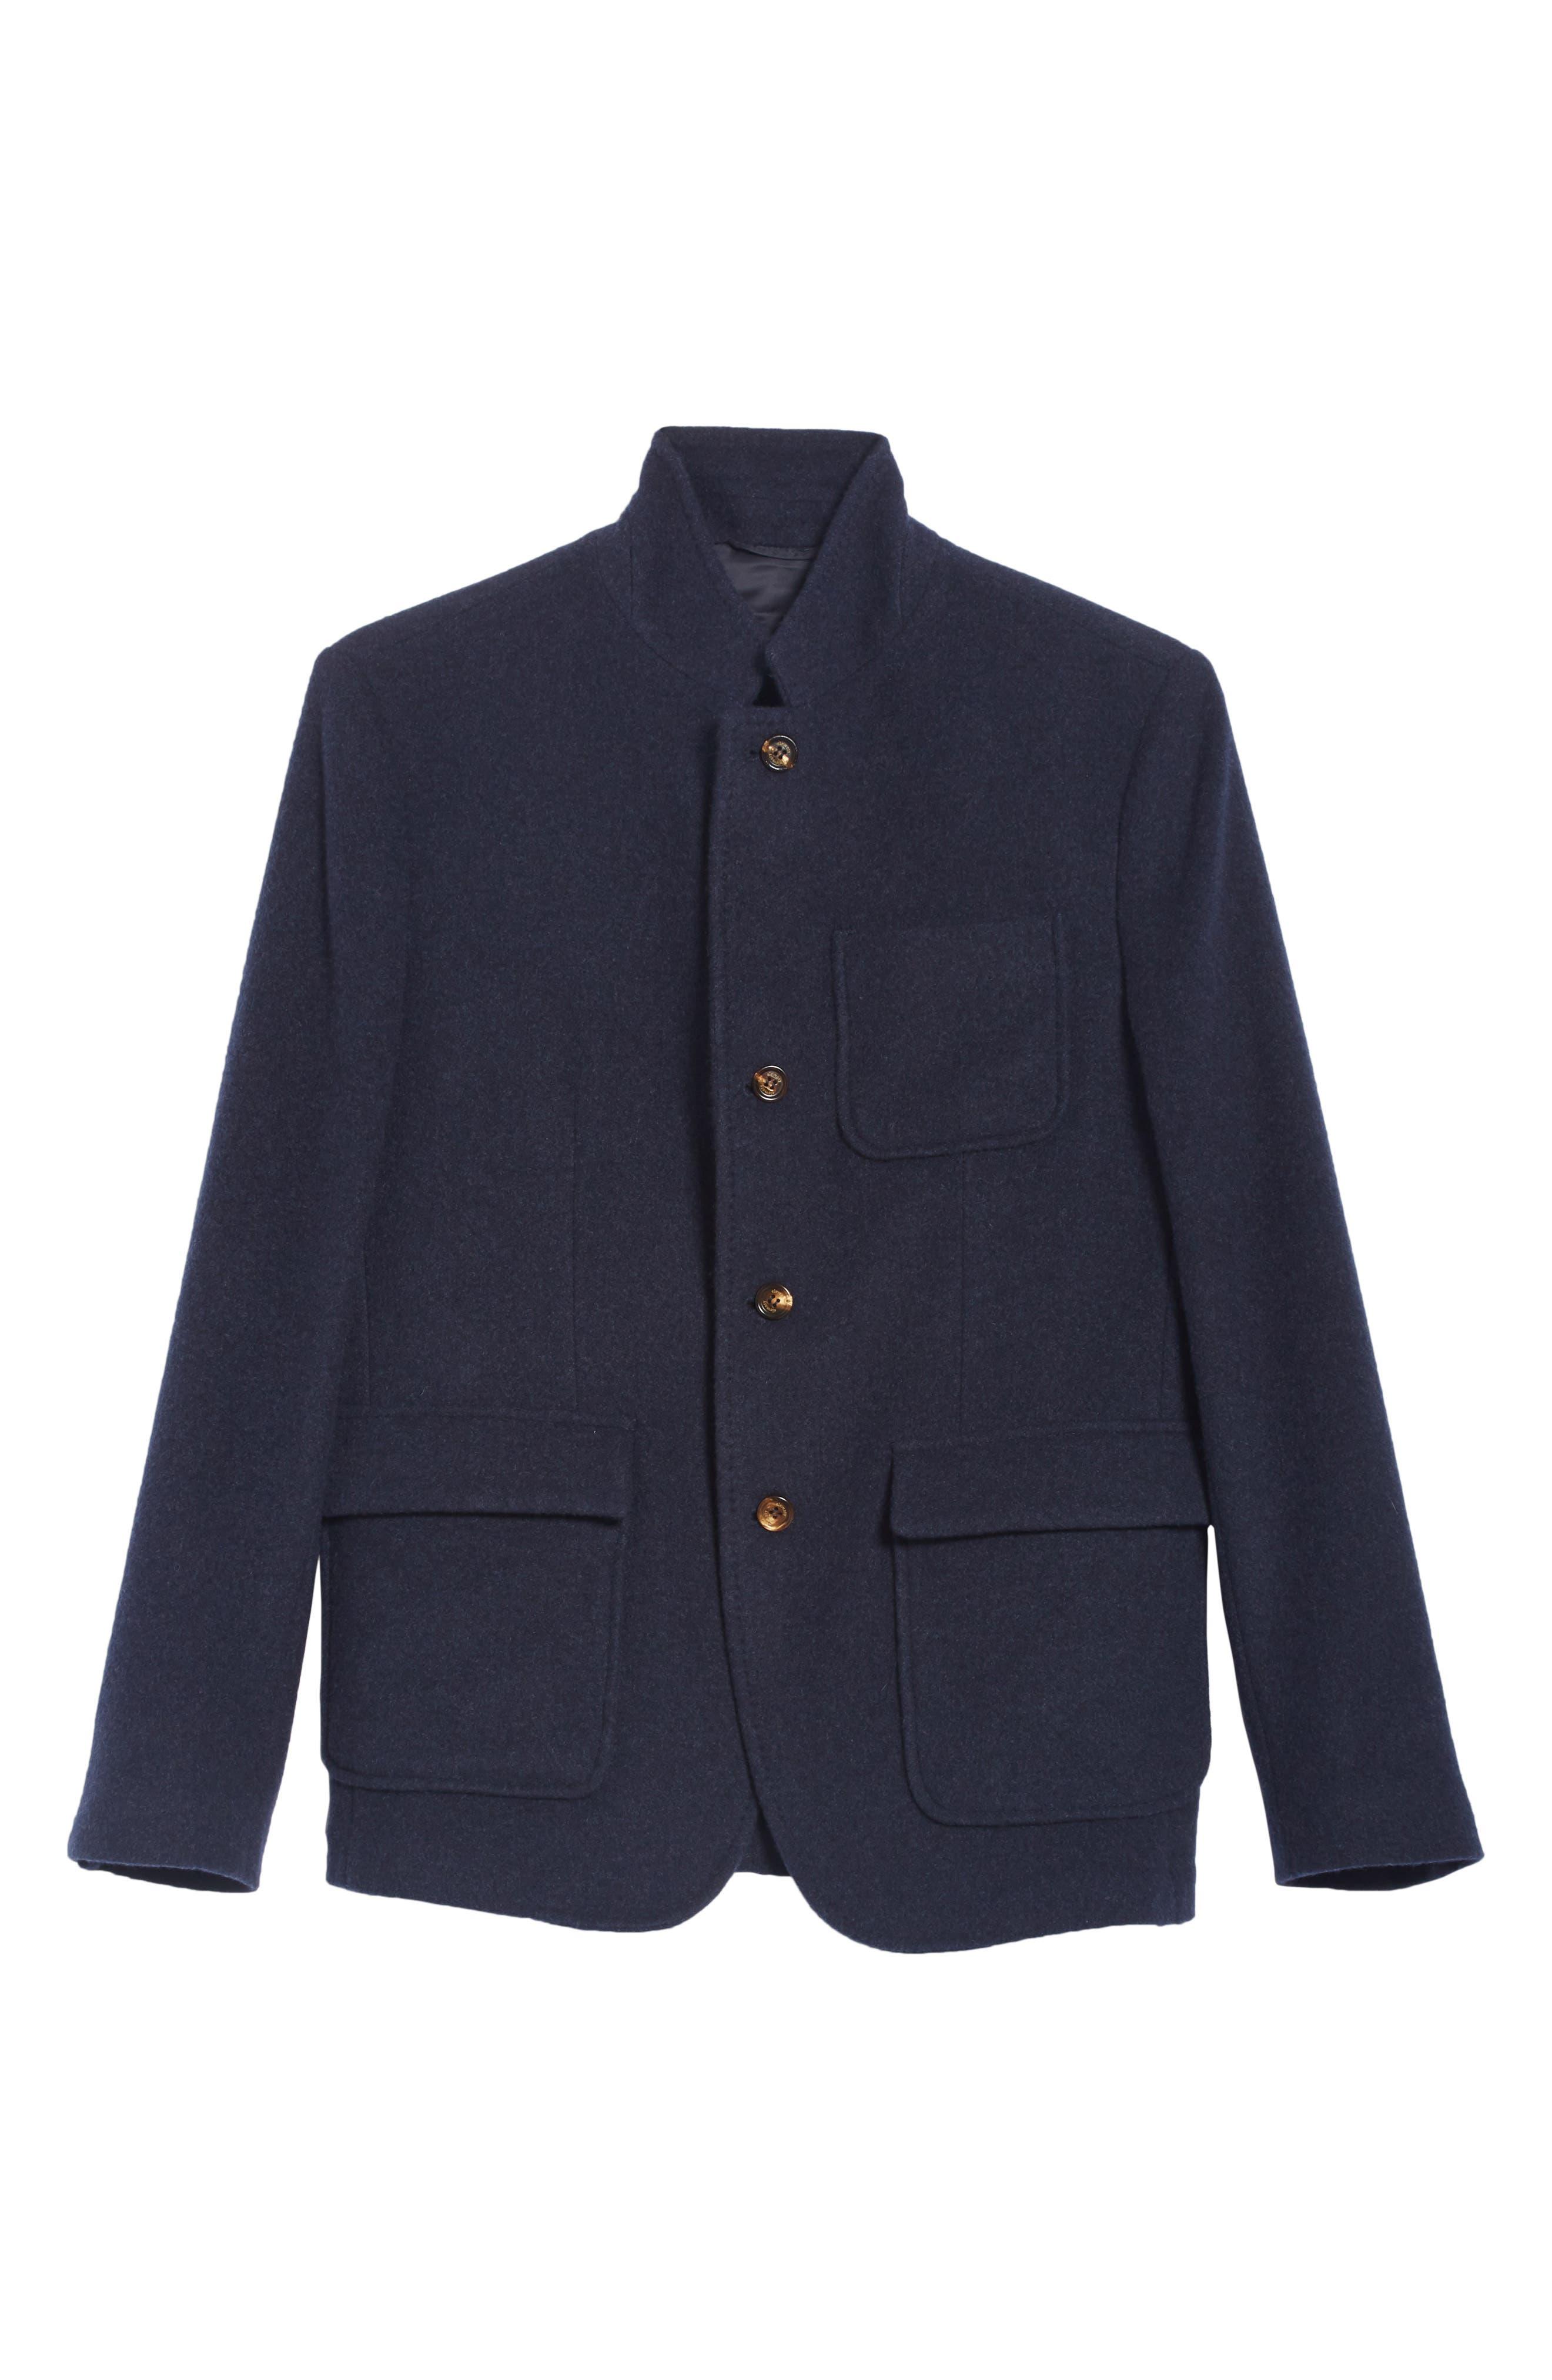 Wool & Cashmere Coat,                             Alternate thumbnail 5, color,                             NAVY